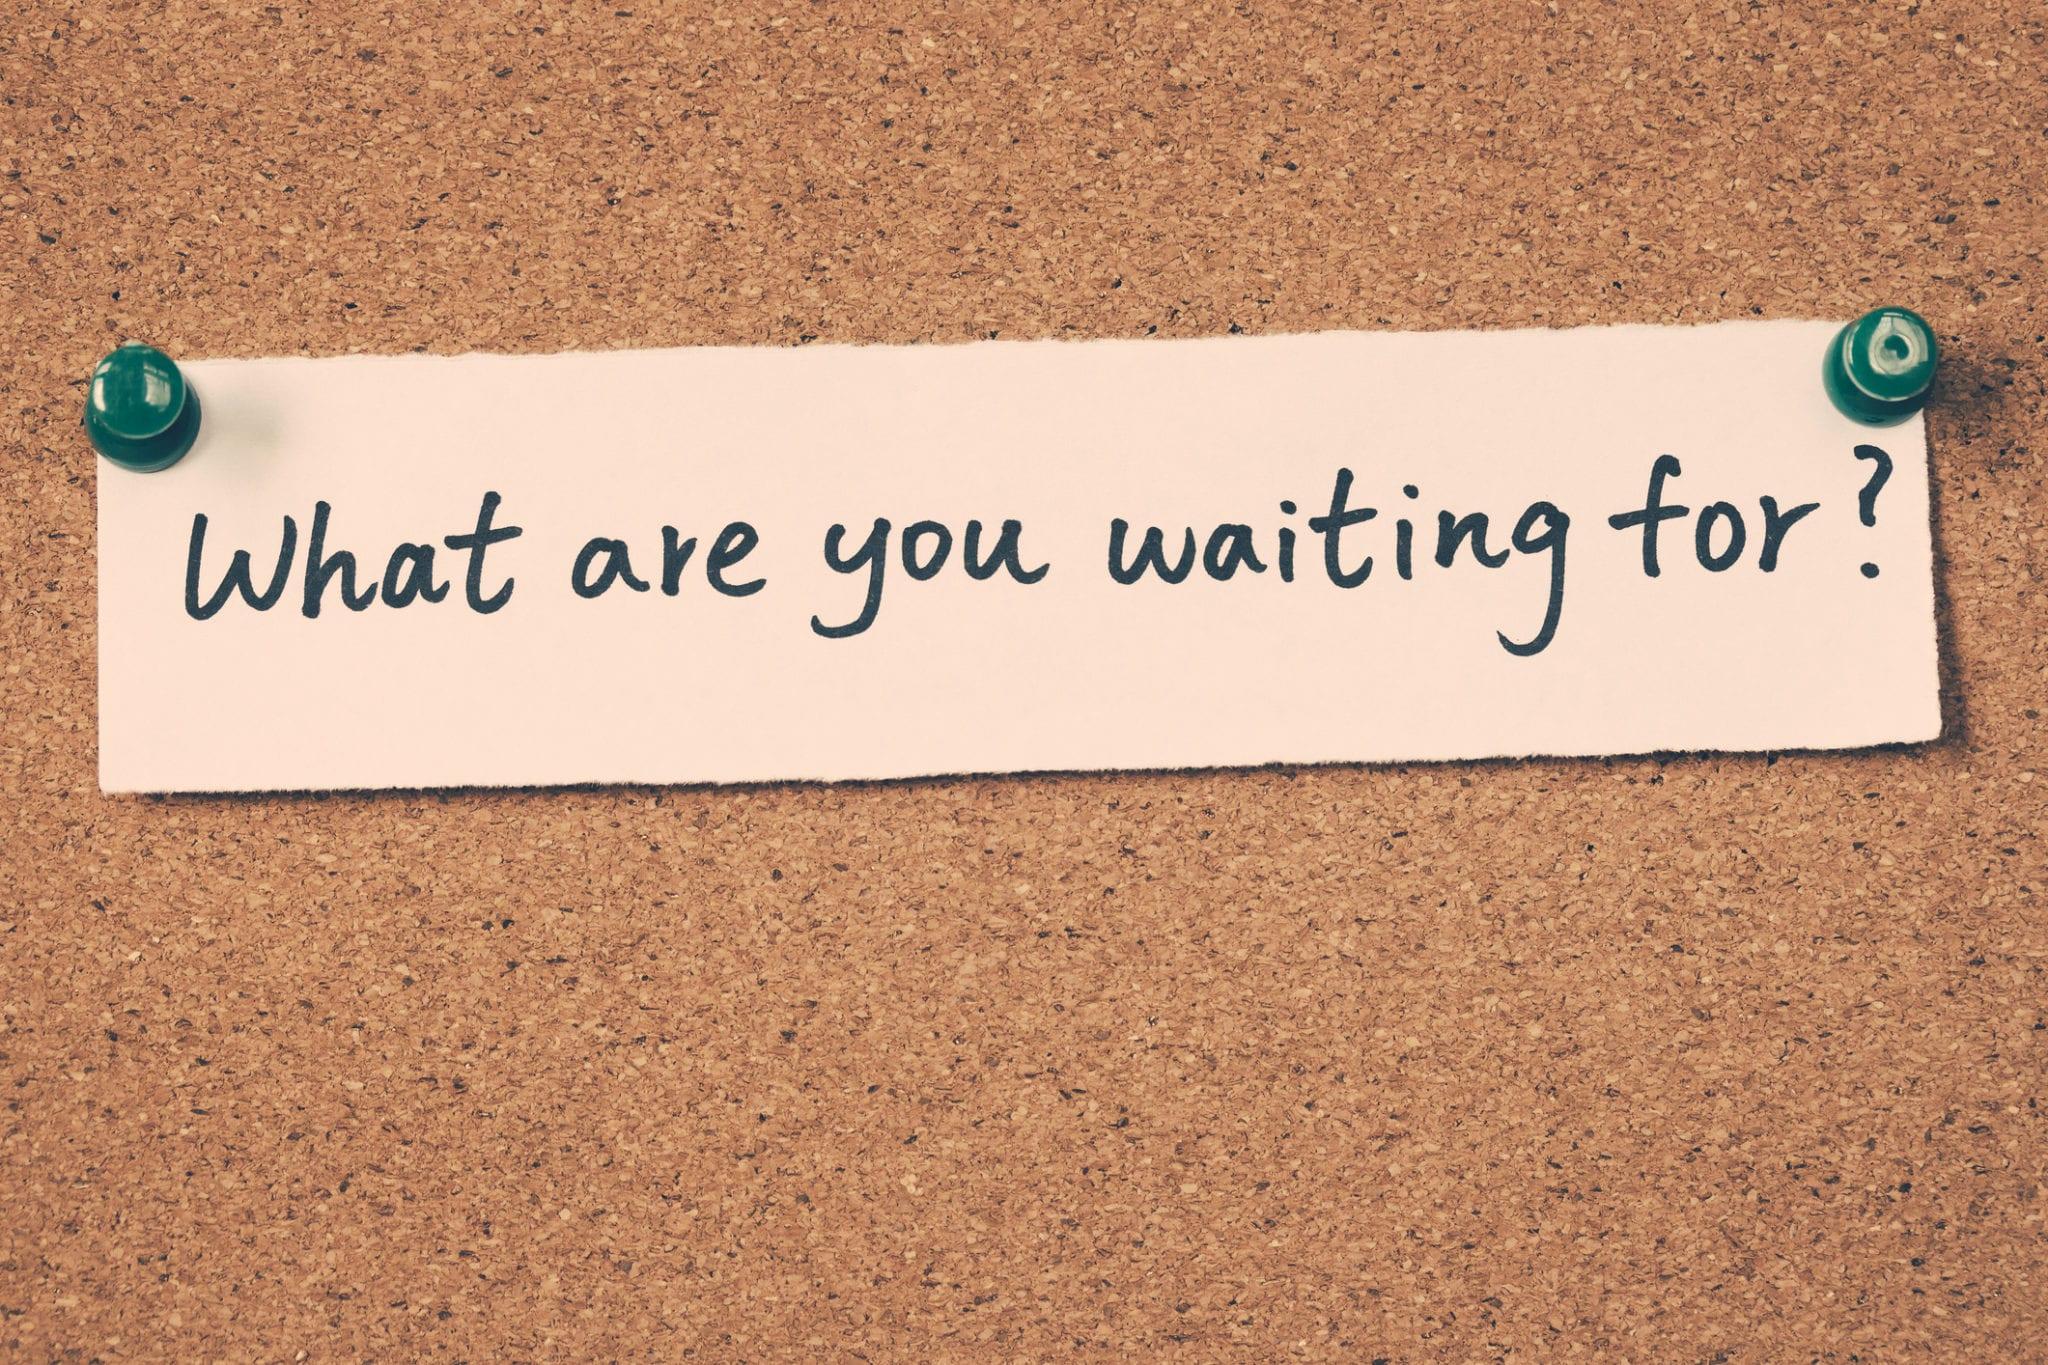 Overcoming procrastination - part 2